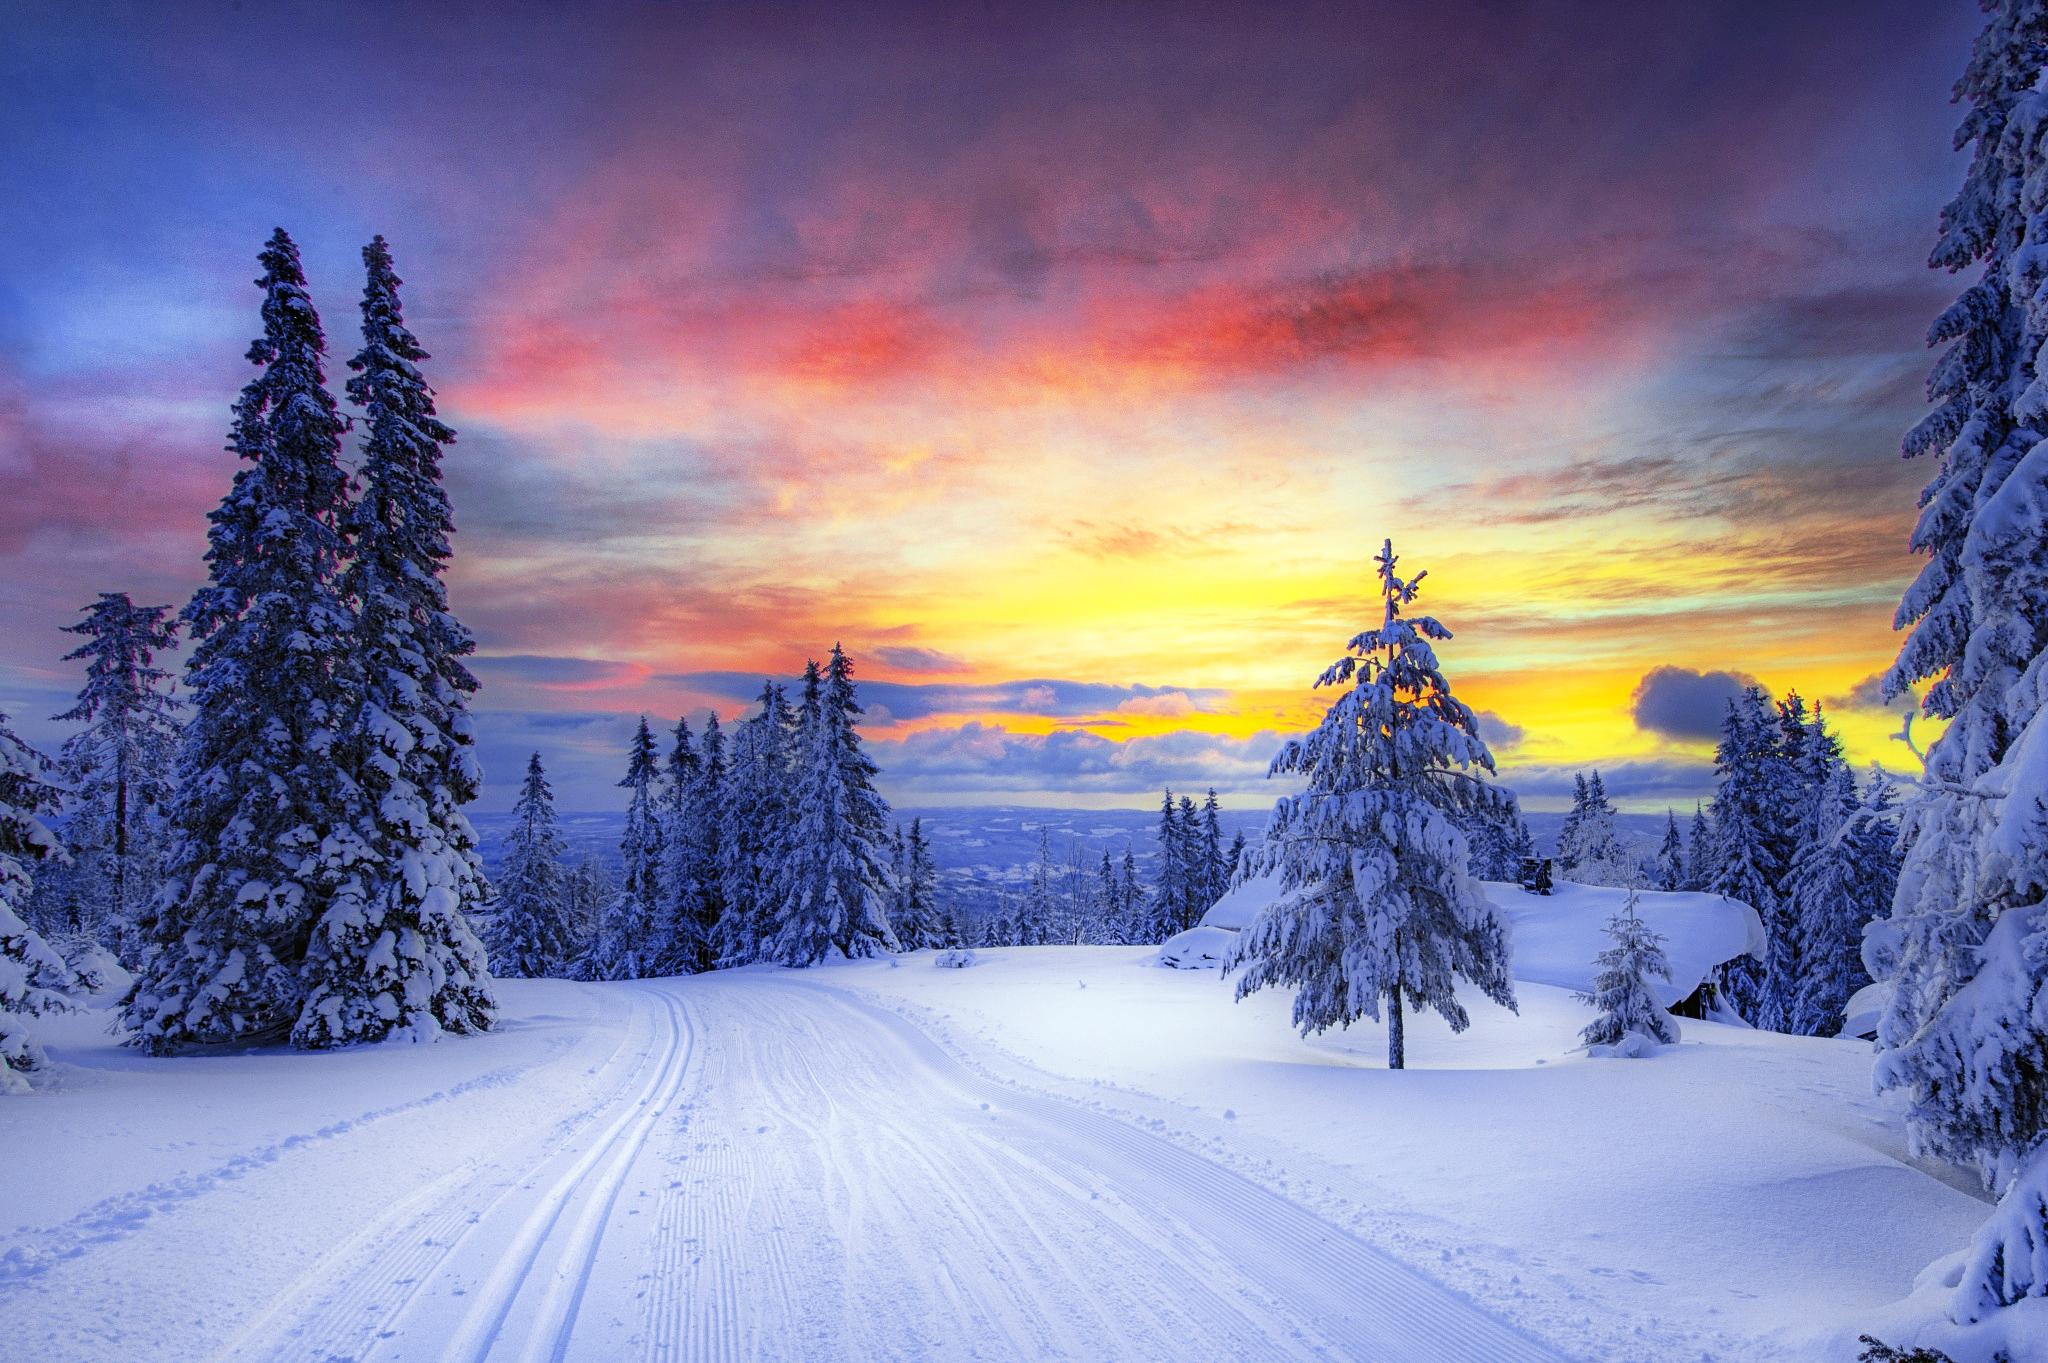 Sunset Over Winter Landscape Hd Wallpaper Background Image 2048x1363